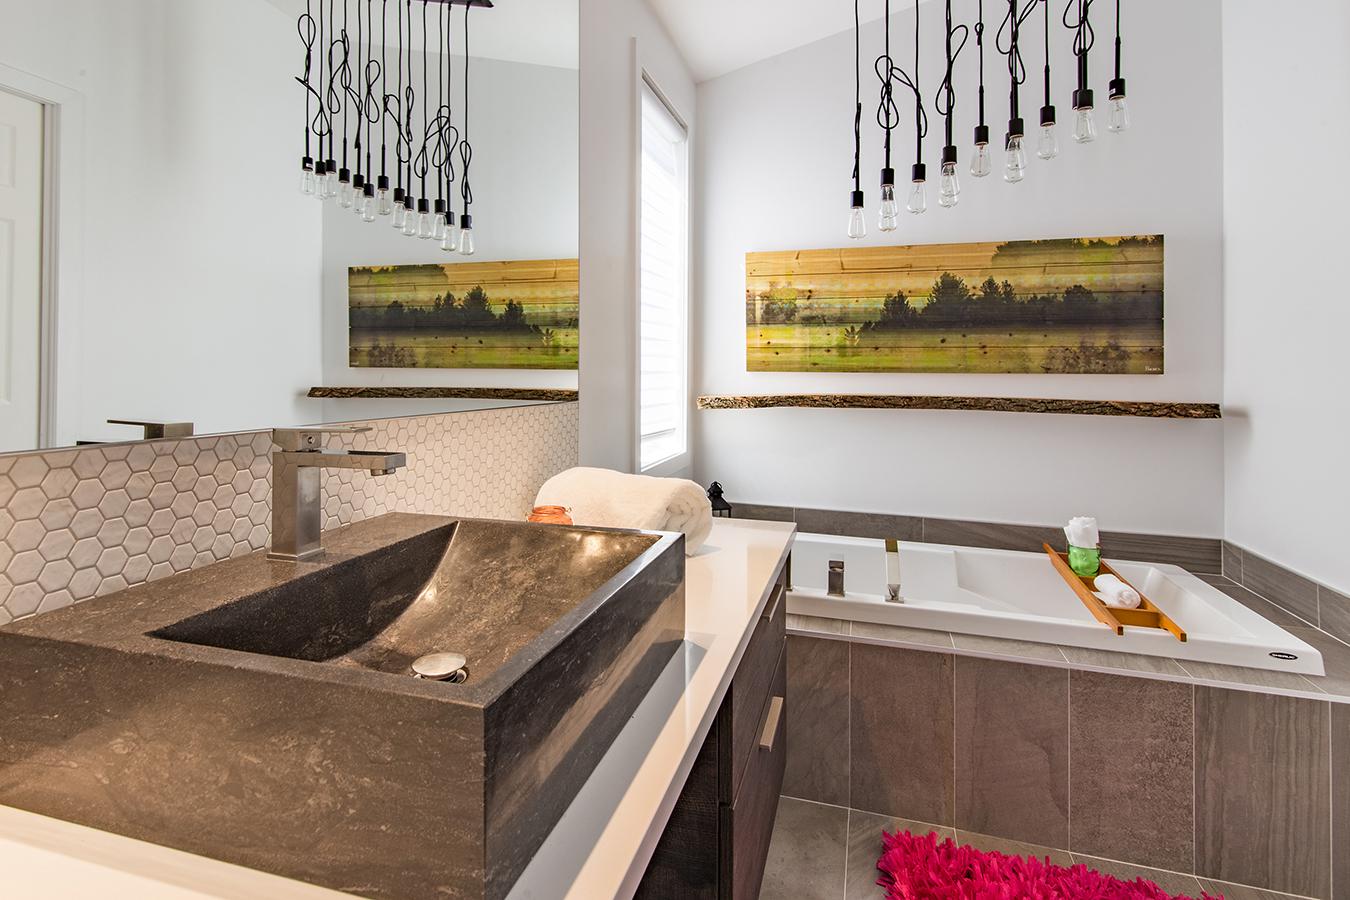 Interieur maison kylie jenner maison moderne for Salle de bain kylie jenner